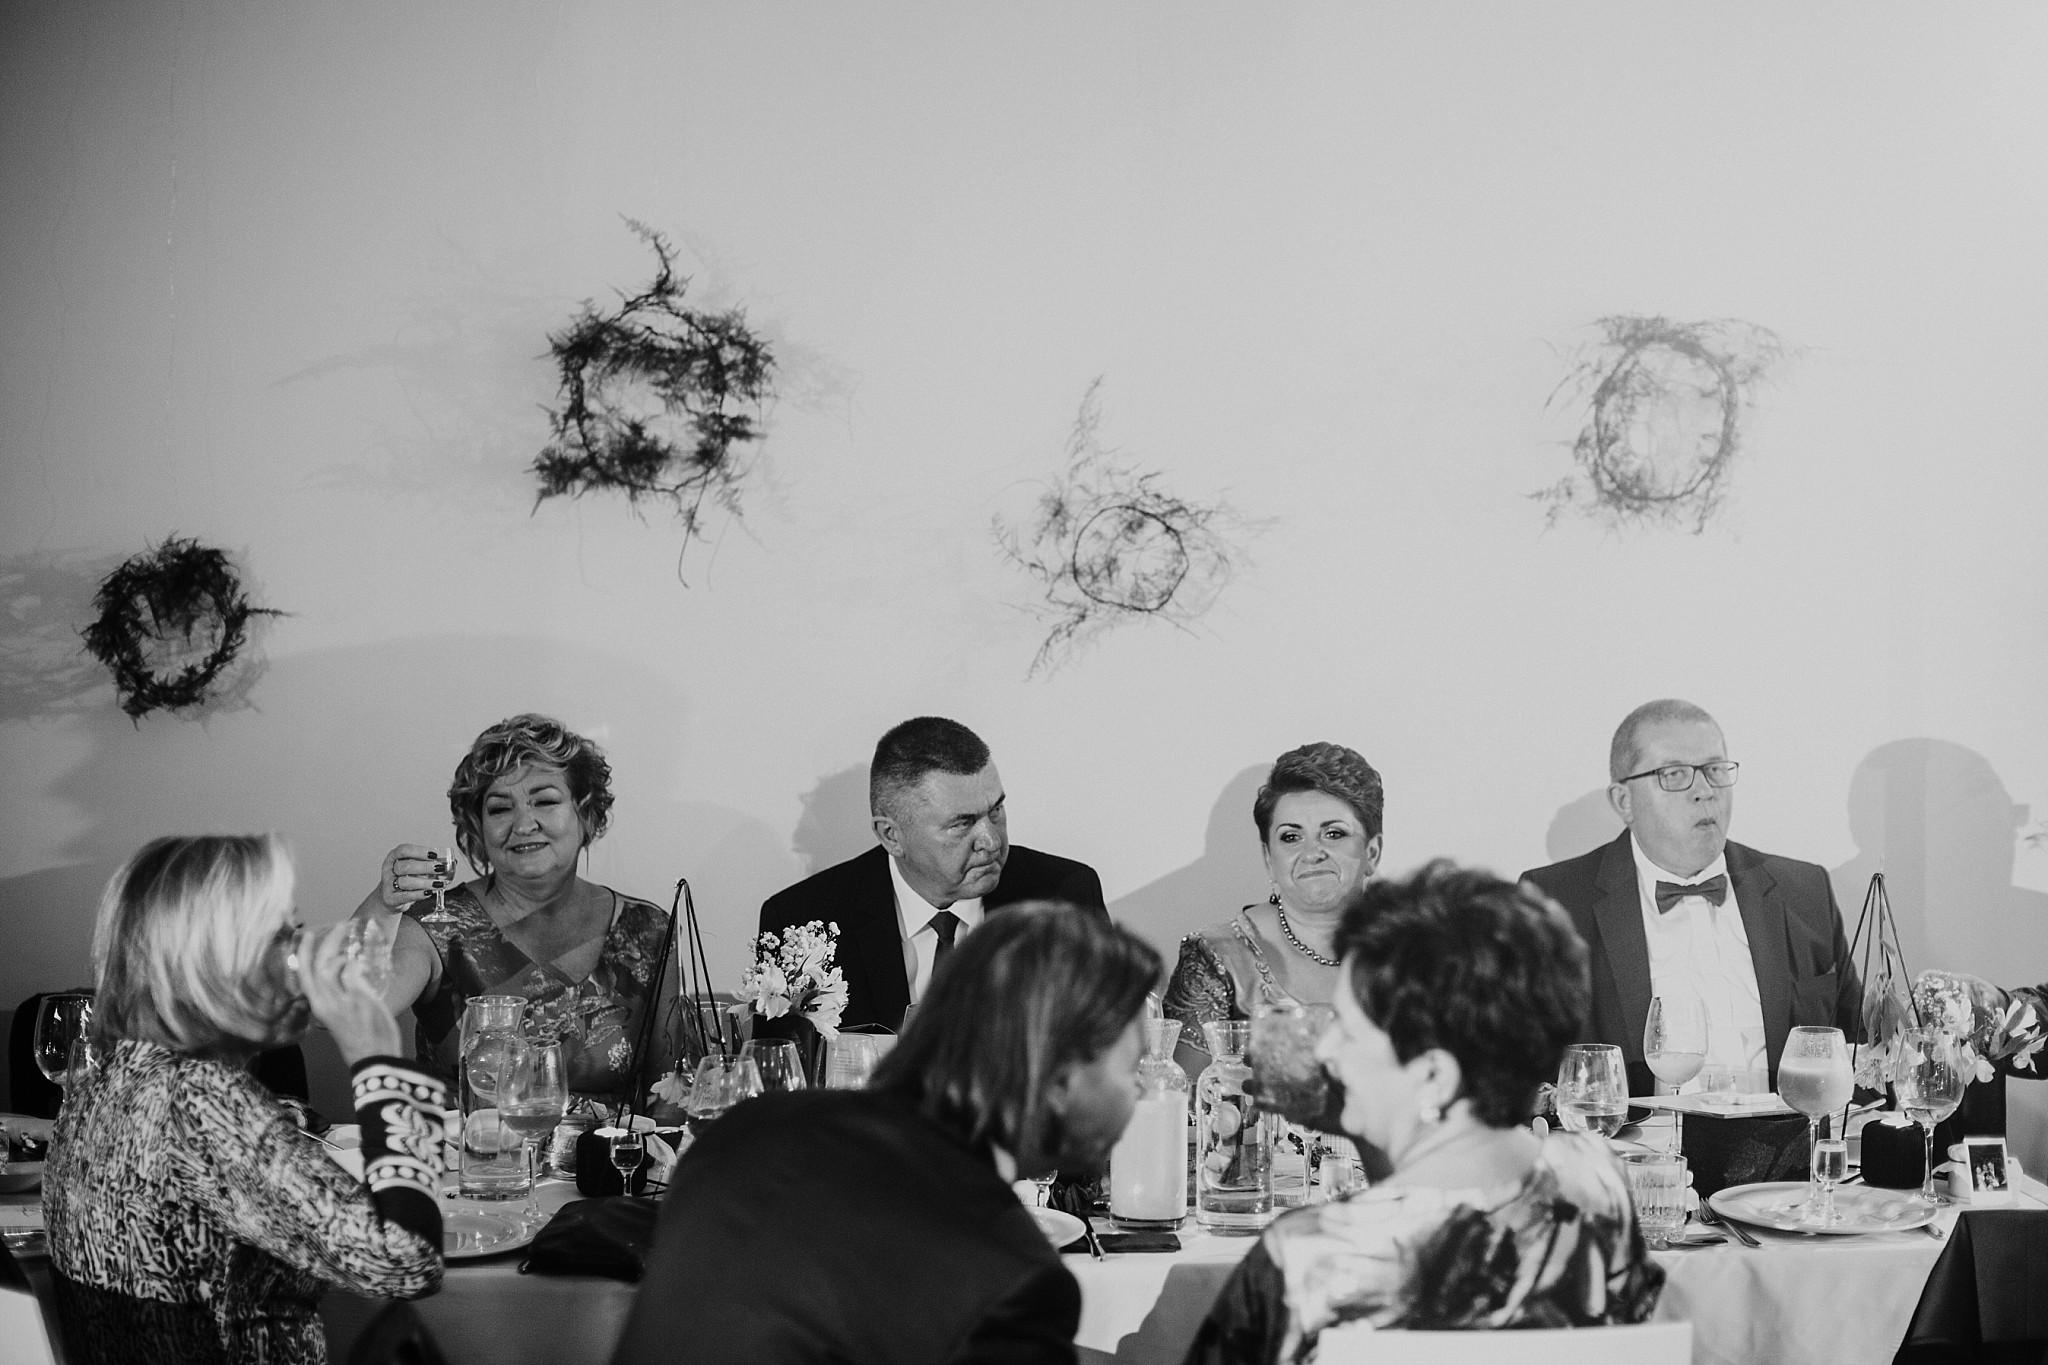 fotograf poznan wesele dobra truskawka piekne wesele pod poznaniem wesele w dobrej truskawce piekna para mloda slub marzen slub koronawirus slub listopad wesele koronawirus 461